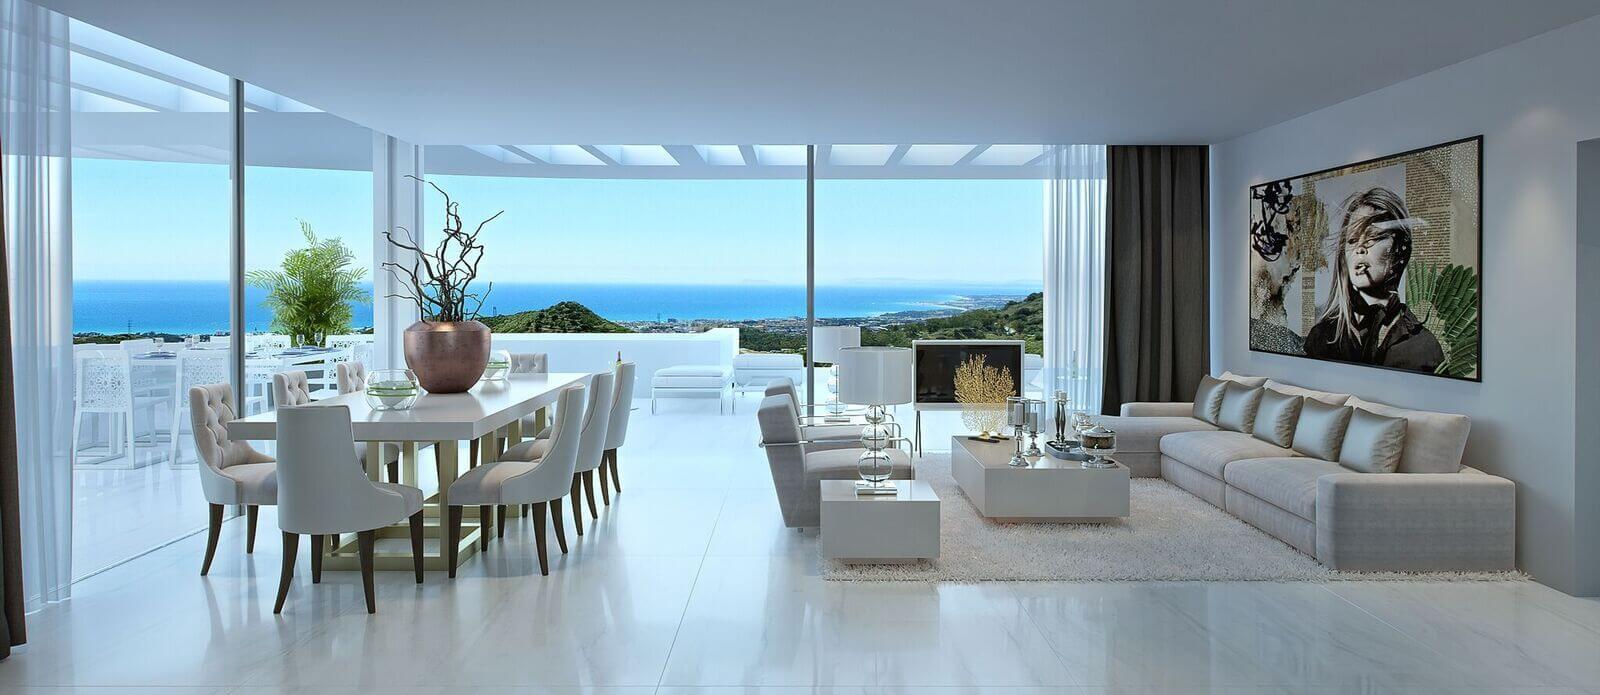 palo alto ojen marbella nieuwbouw resort luxe te koop appartement penthouse modern las jacarandas living